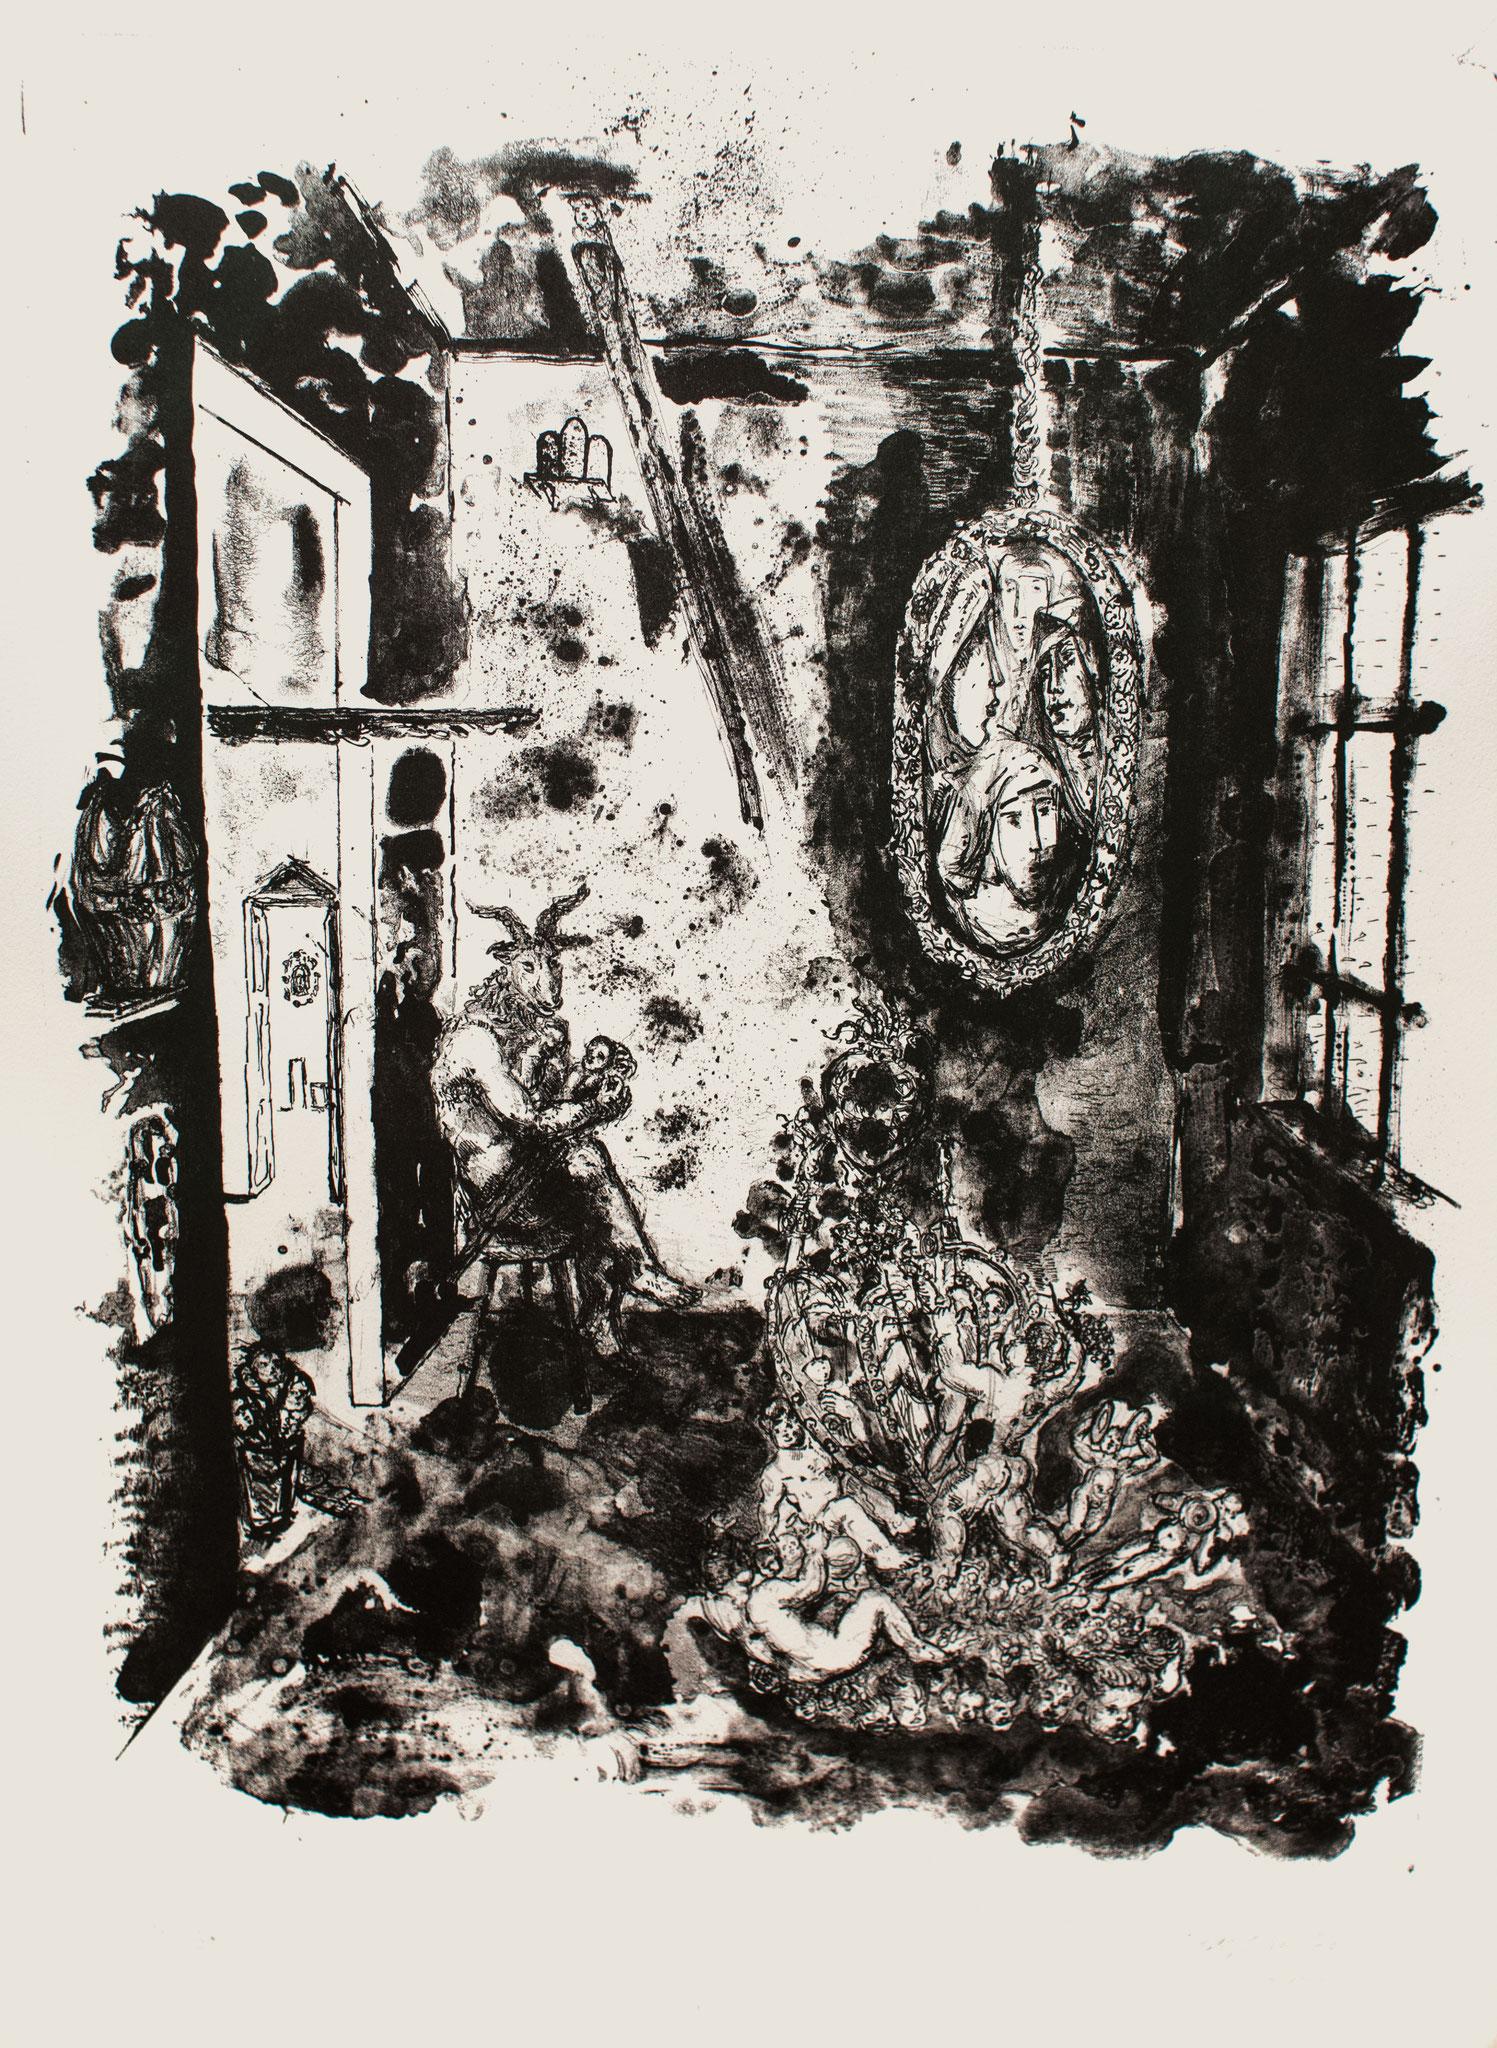 Behütet, 1990, Lithographie, 63cm x 46cm